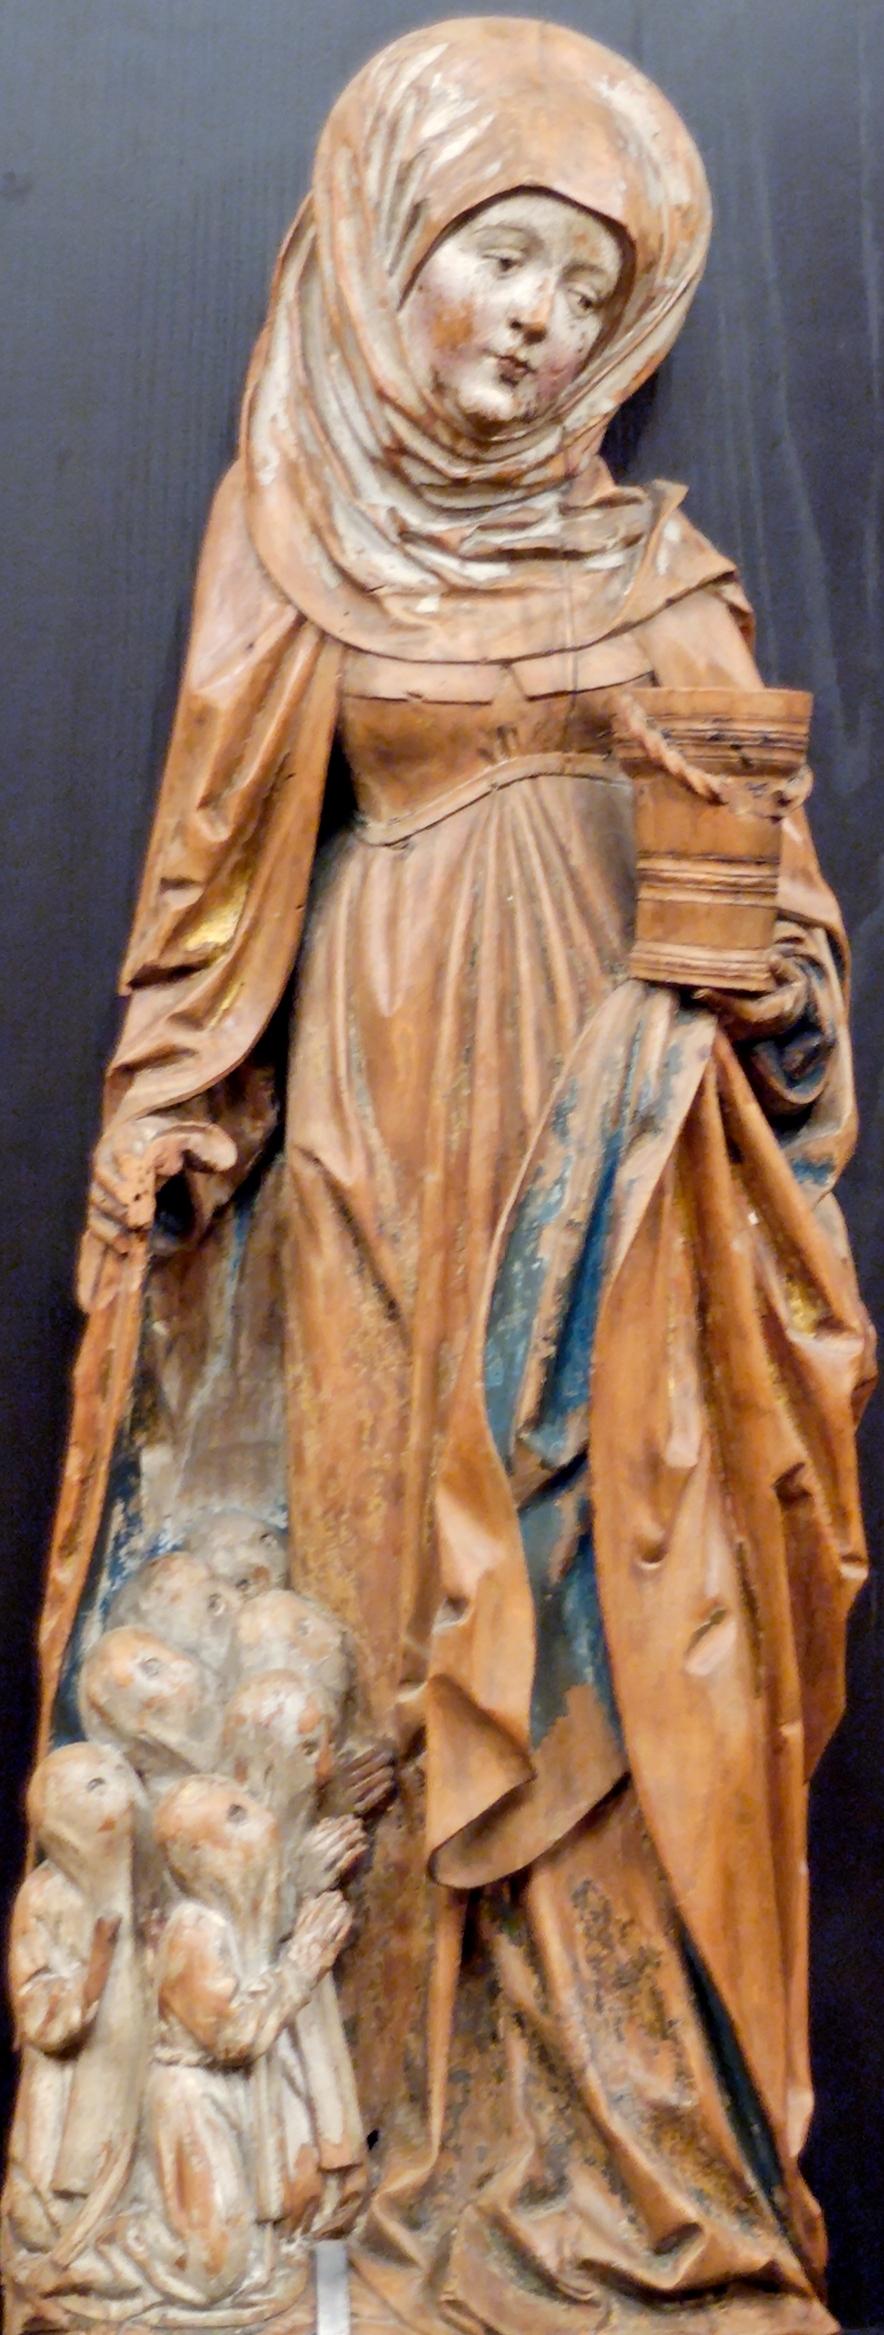 Santa Marta dans immagini sacre saint-martha-03